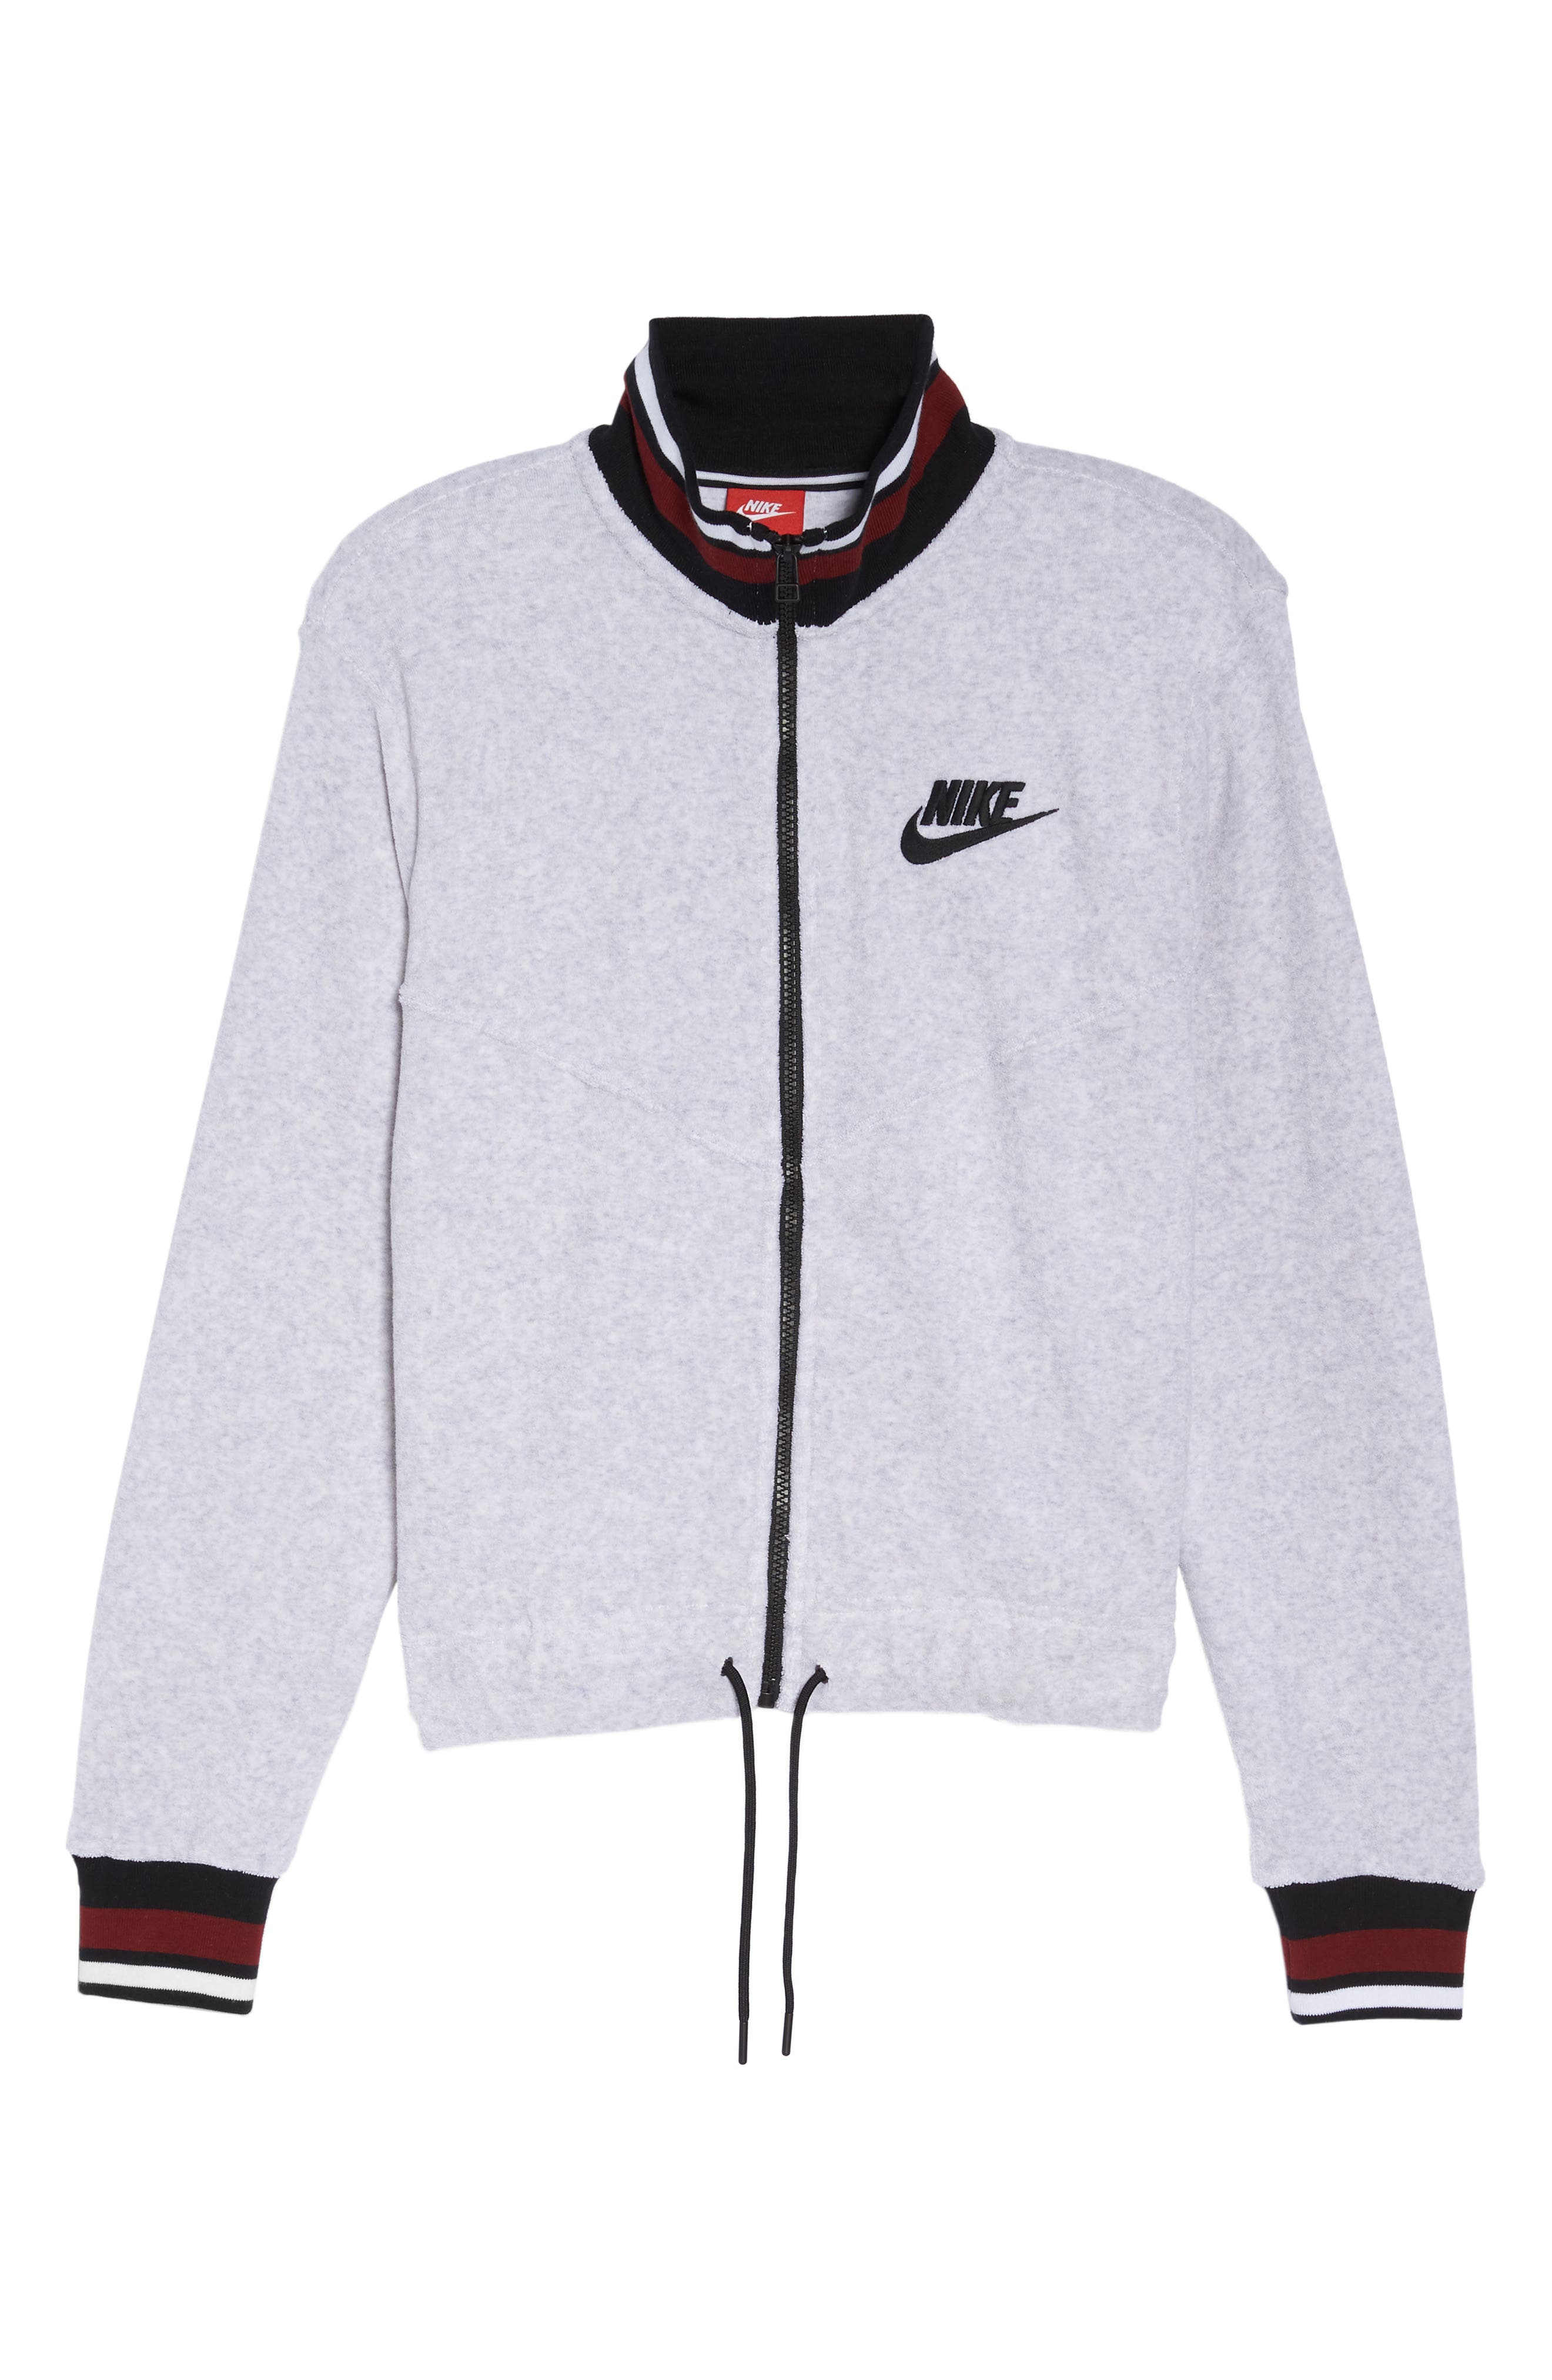 Sportswear French Terry Jacket,                             Alternate thumbnail 8, color,                             Birch Heather/ White/ Black